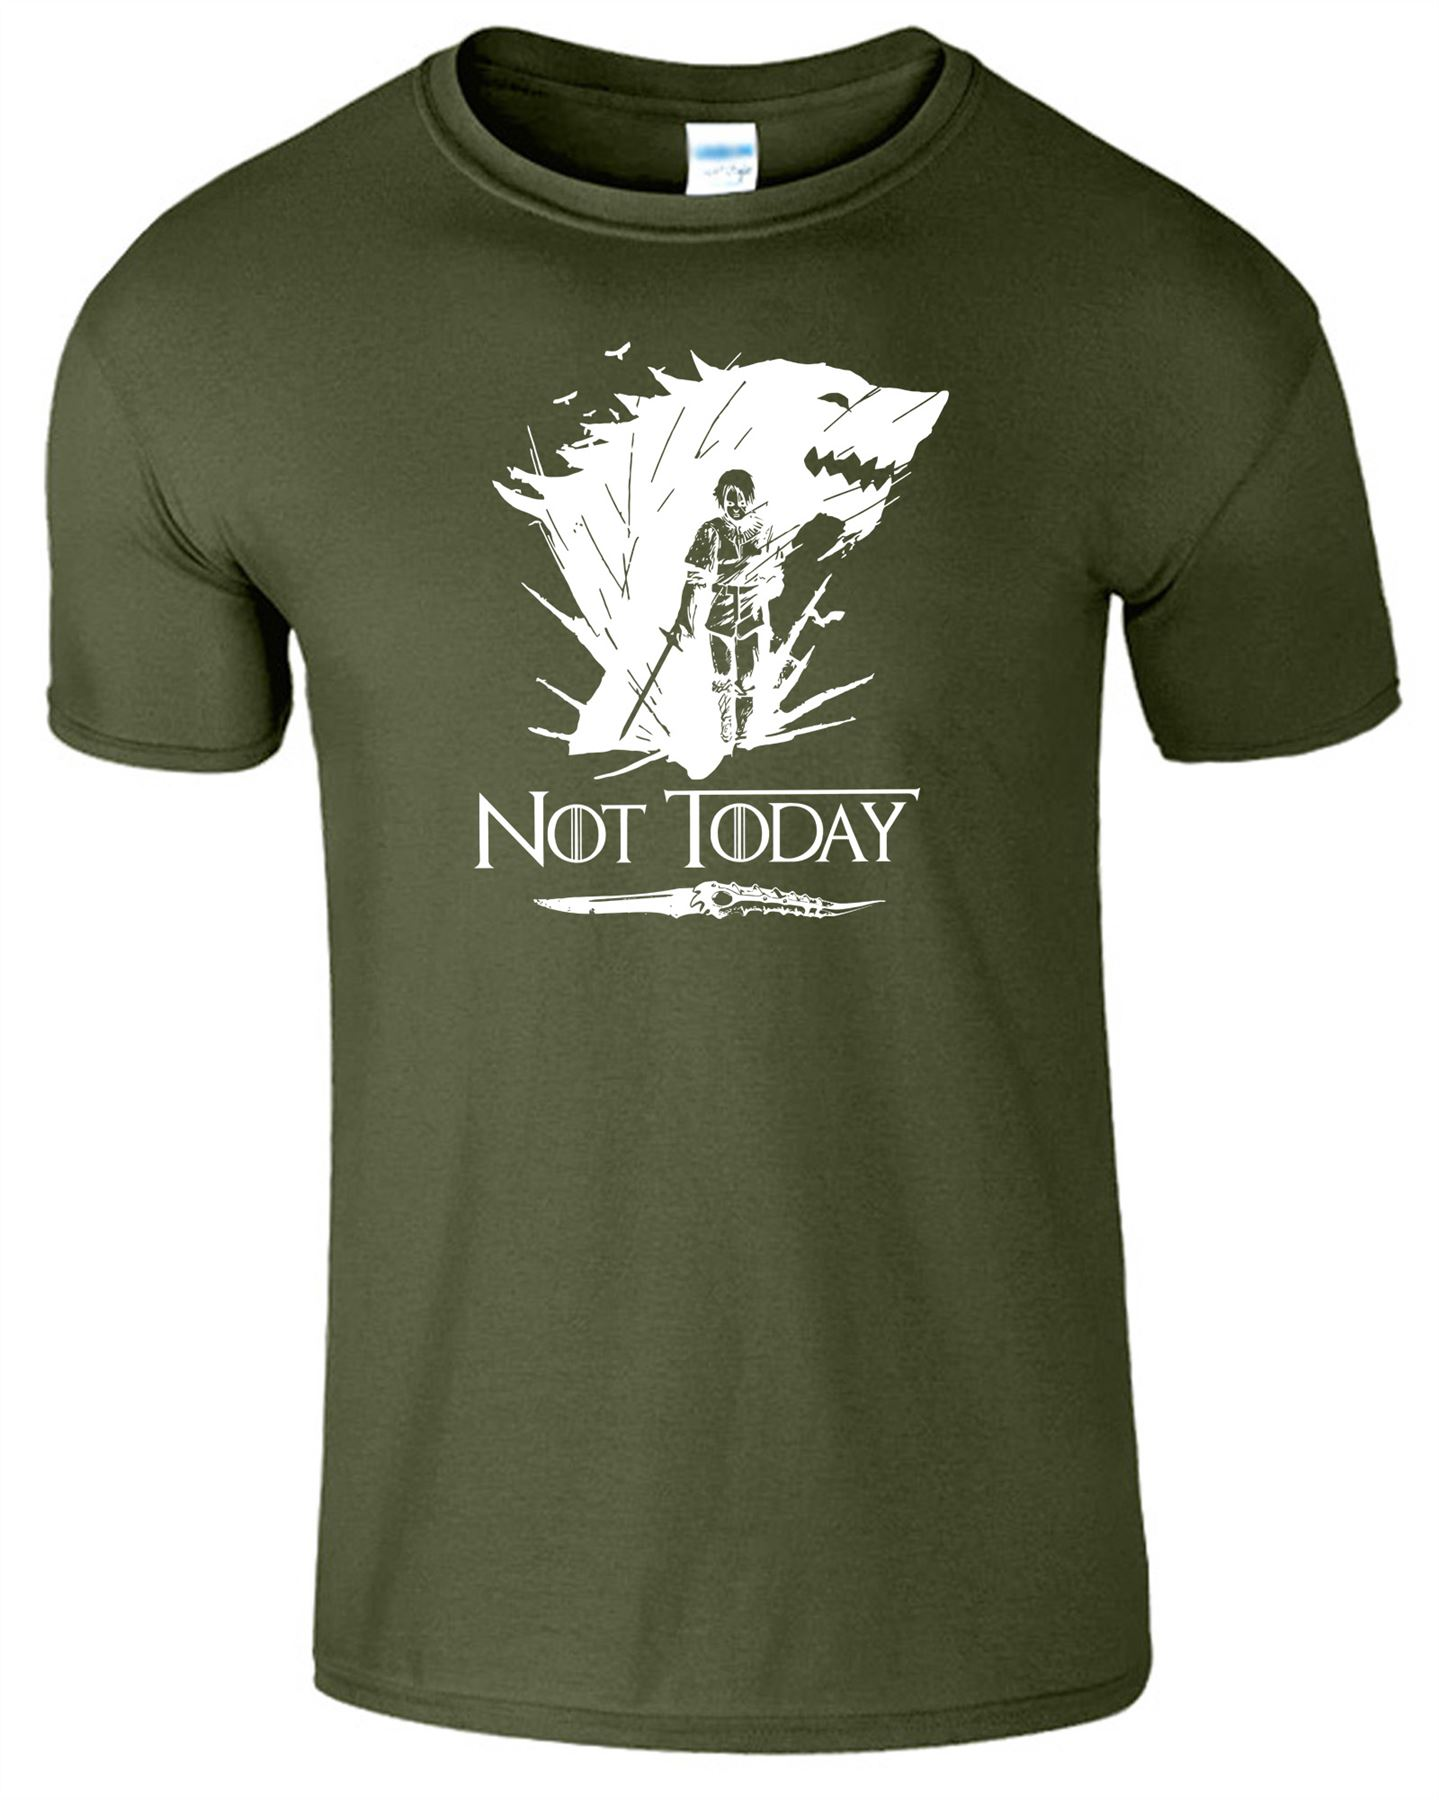 Arya-Stark-Not-Today-T-Shirt-Mens-Game-Season-Womens-Shirt-Adults-Unisex-Fit Indexbild 31